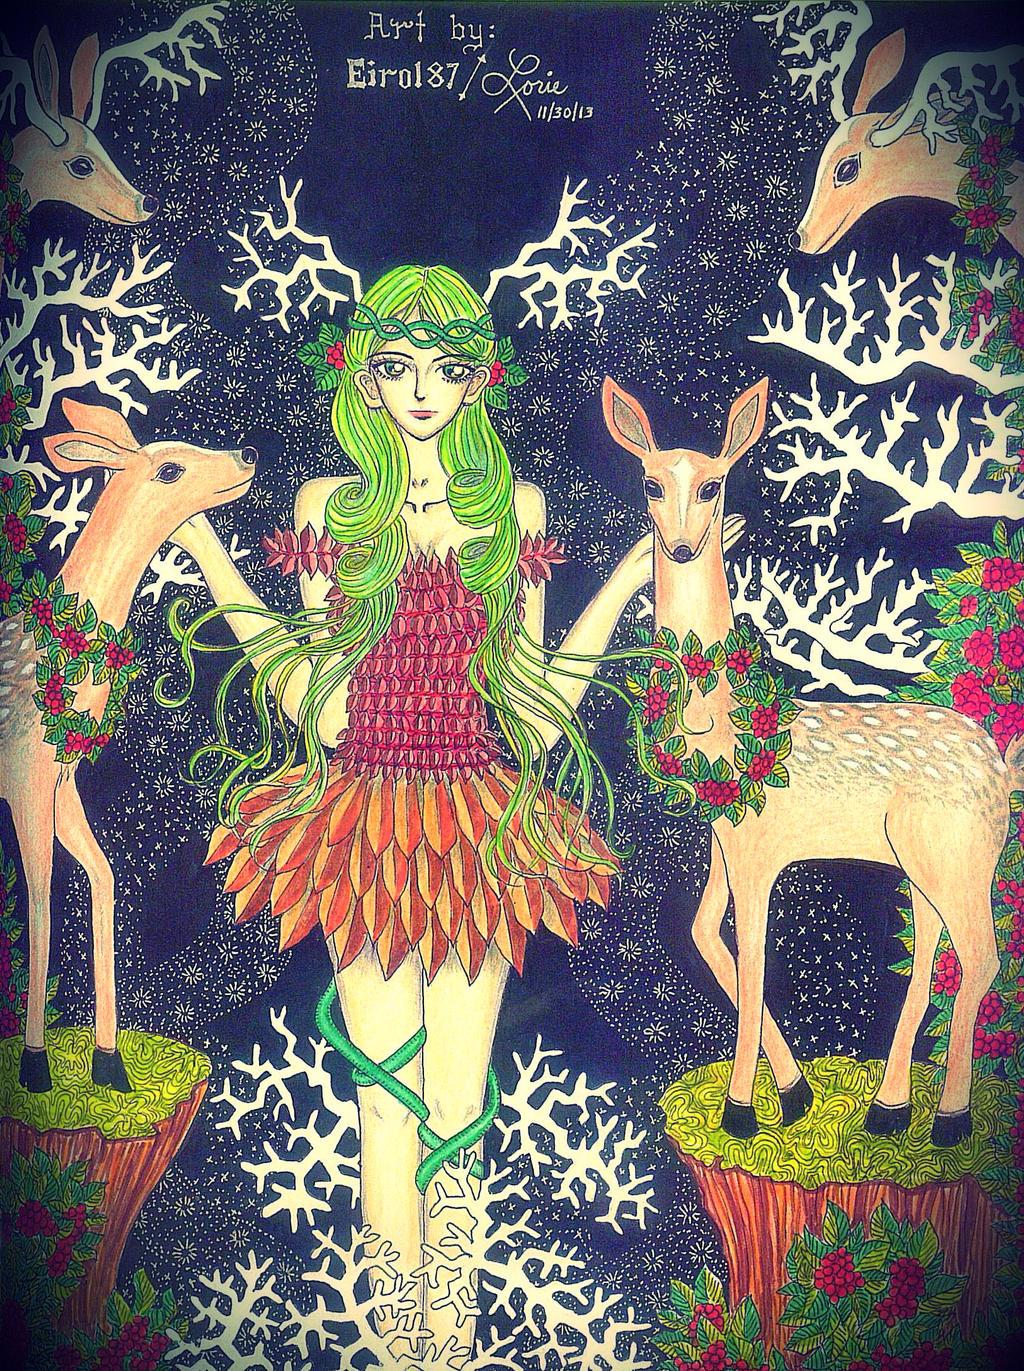 Deer Nymph: Verdeena by eirol87